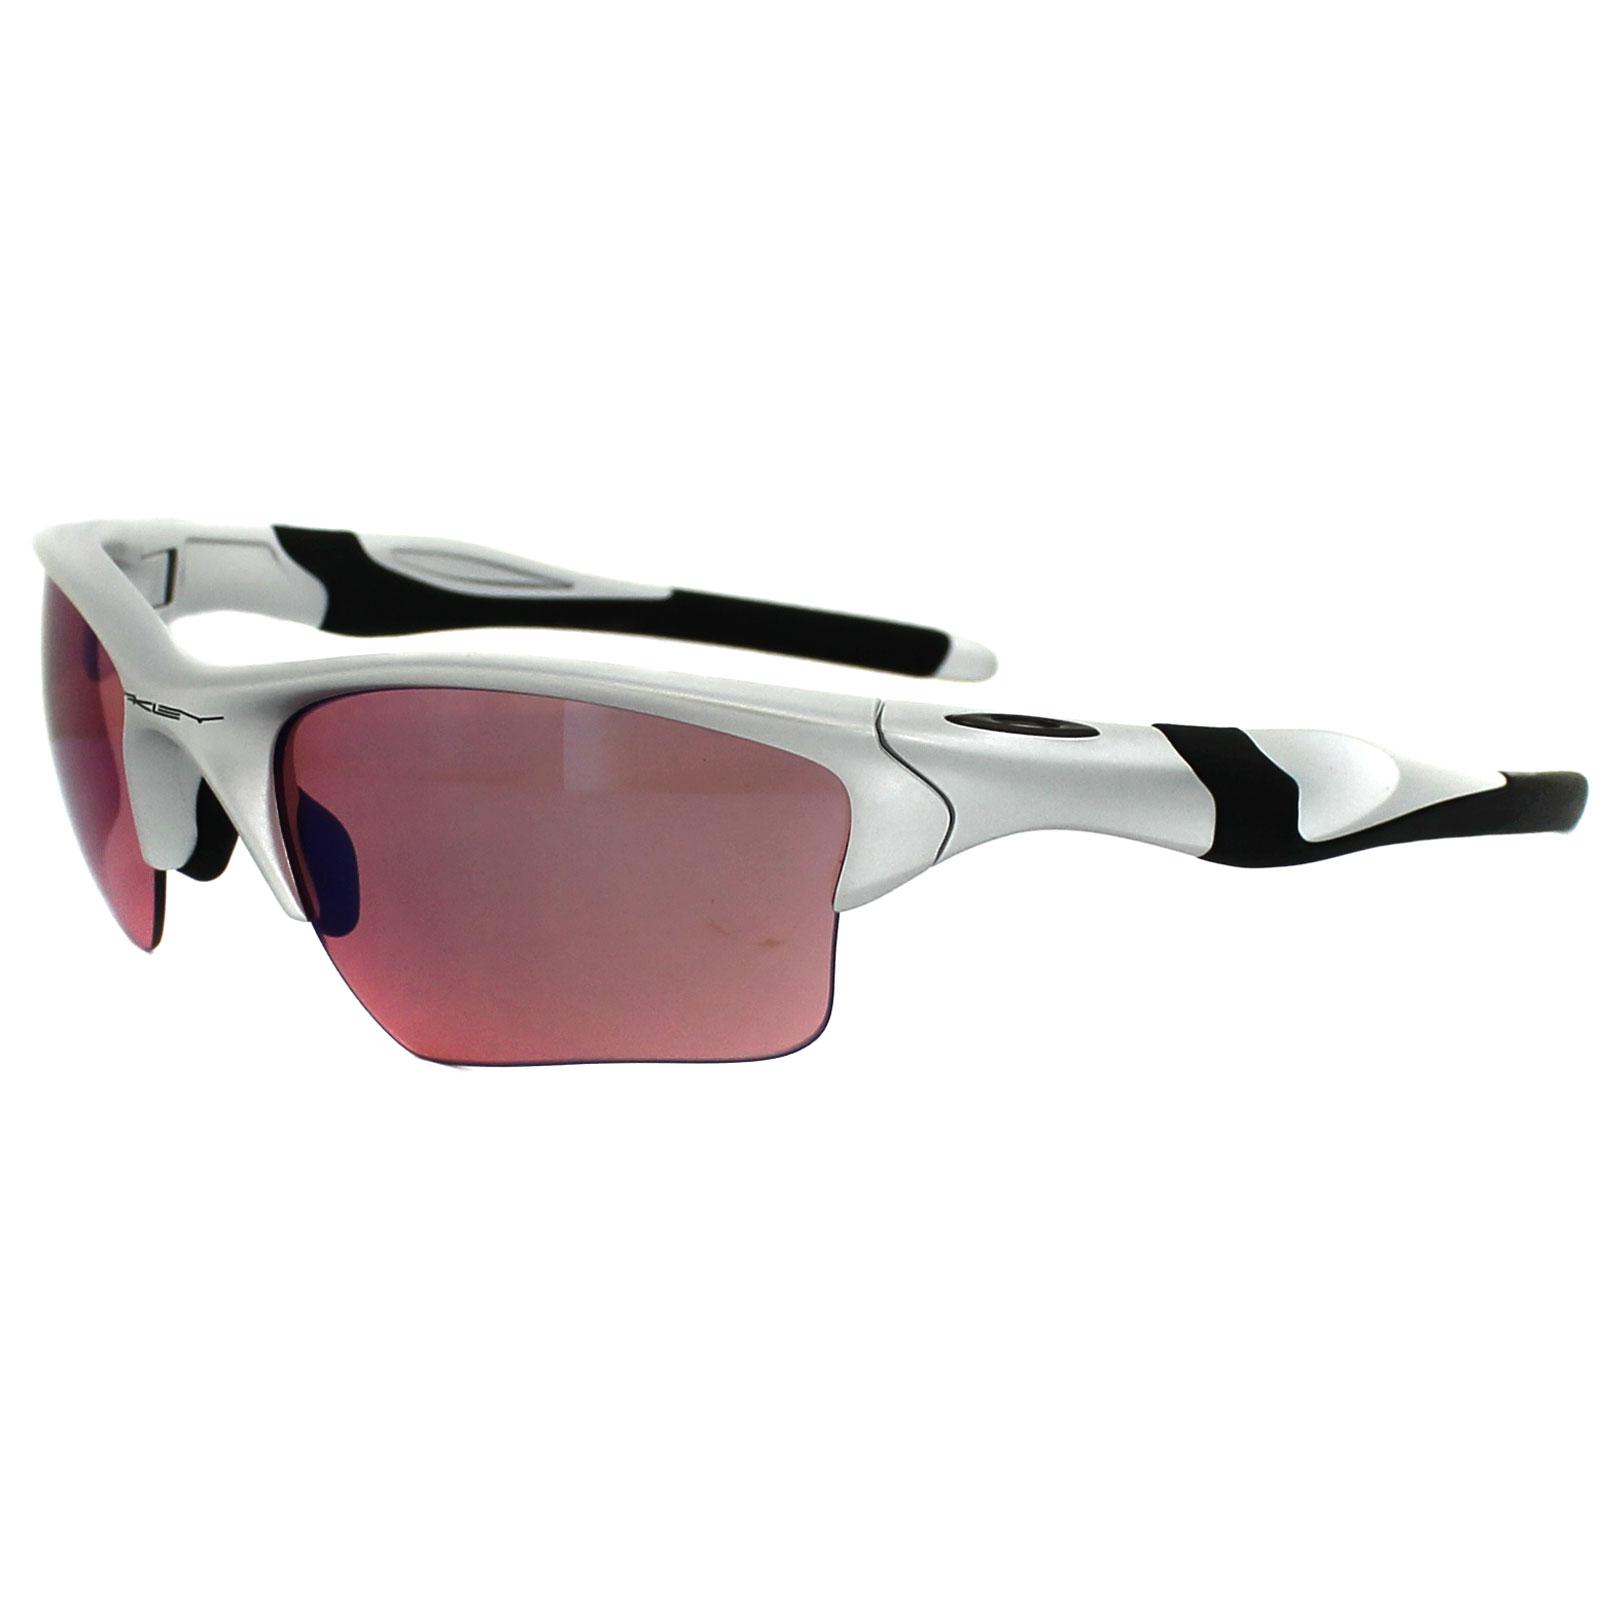 V60oispb2hktd13 Discount Sunglasses Oakley